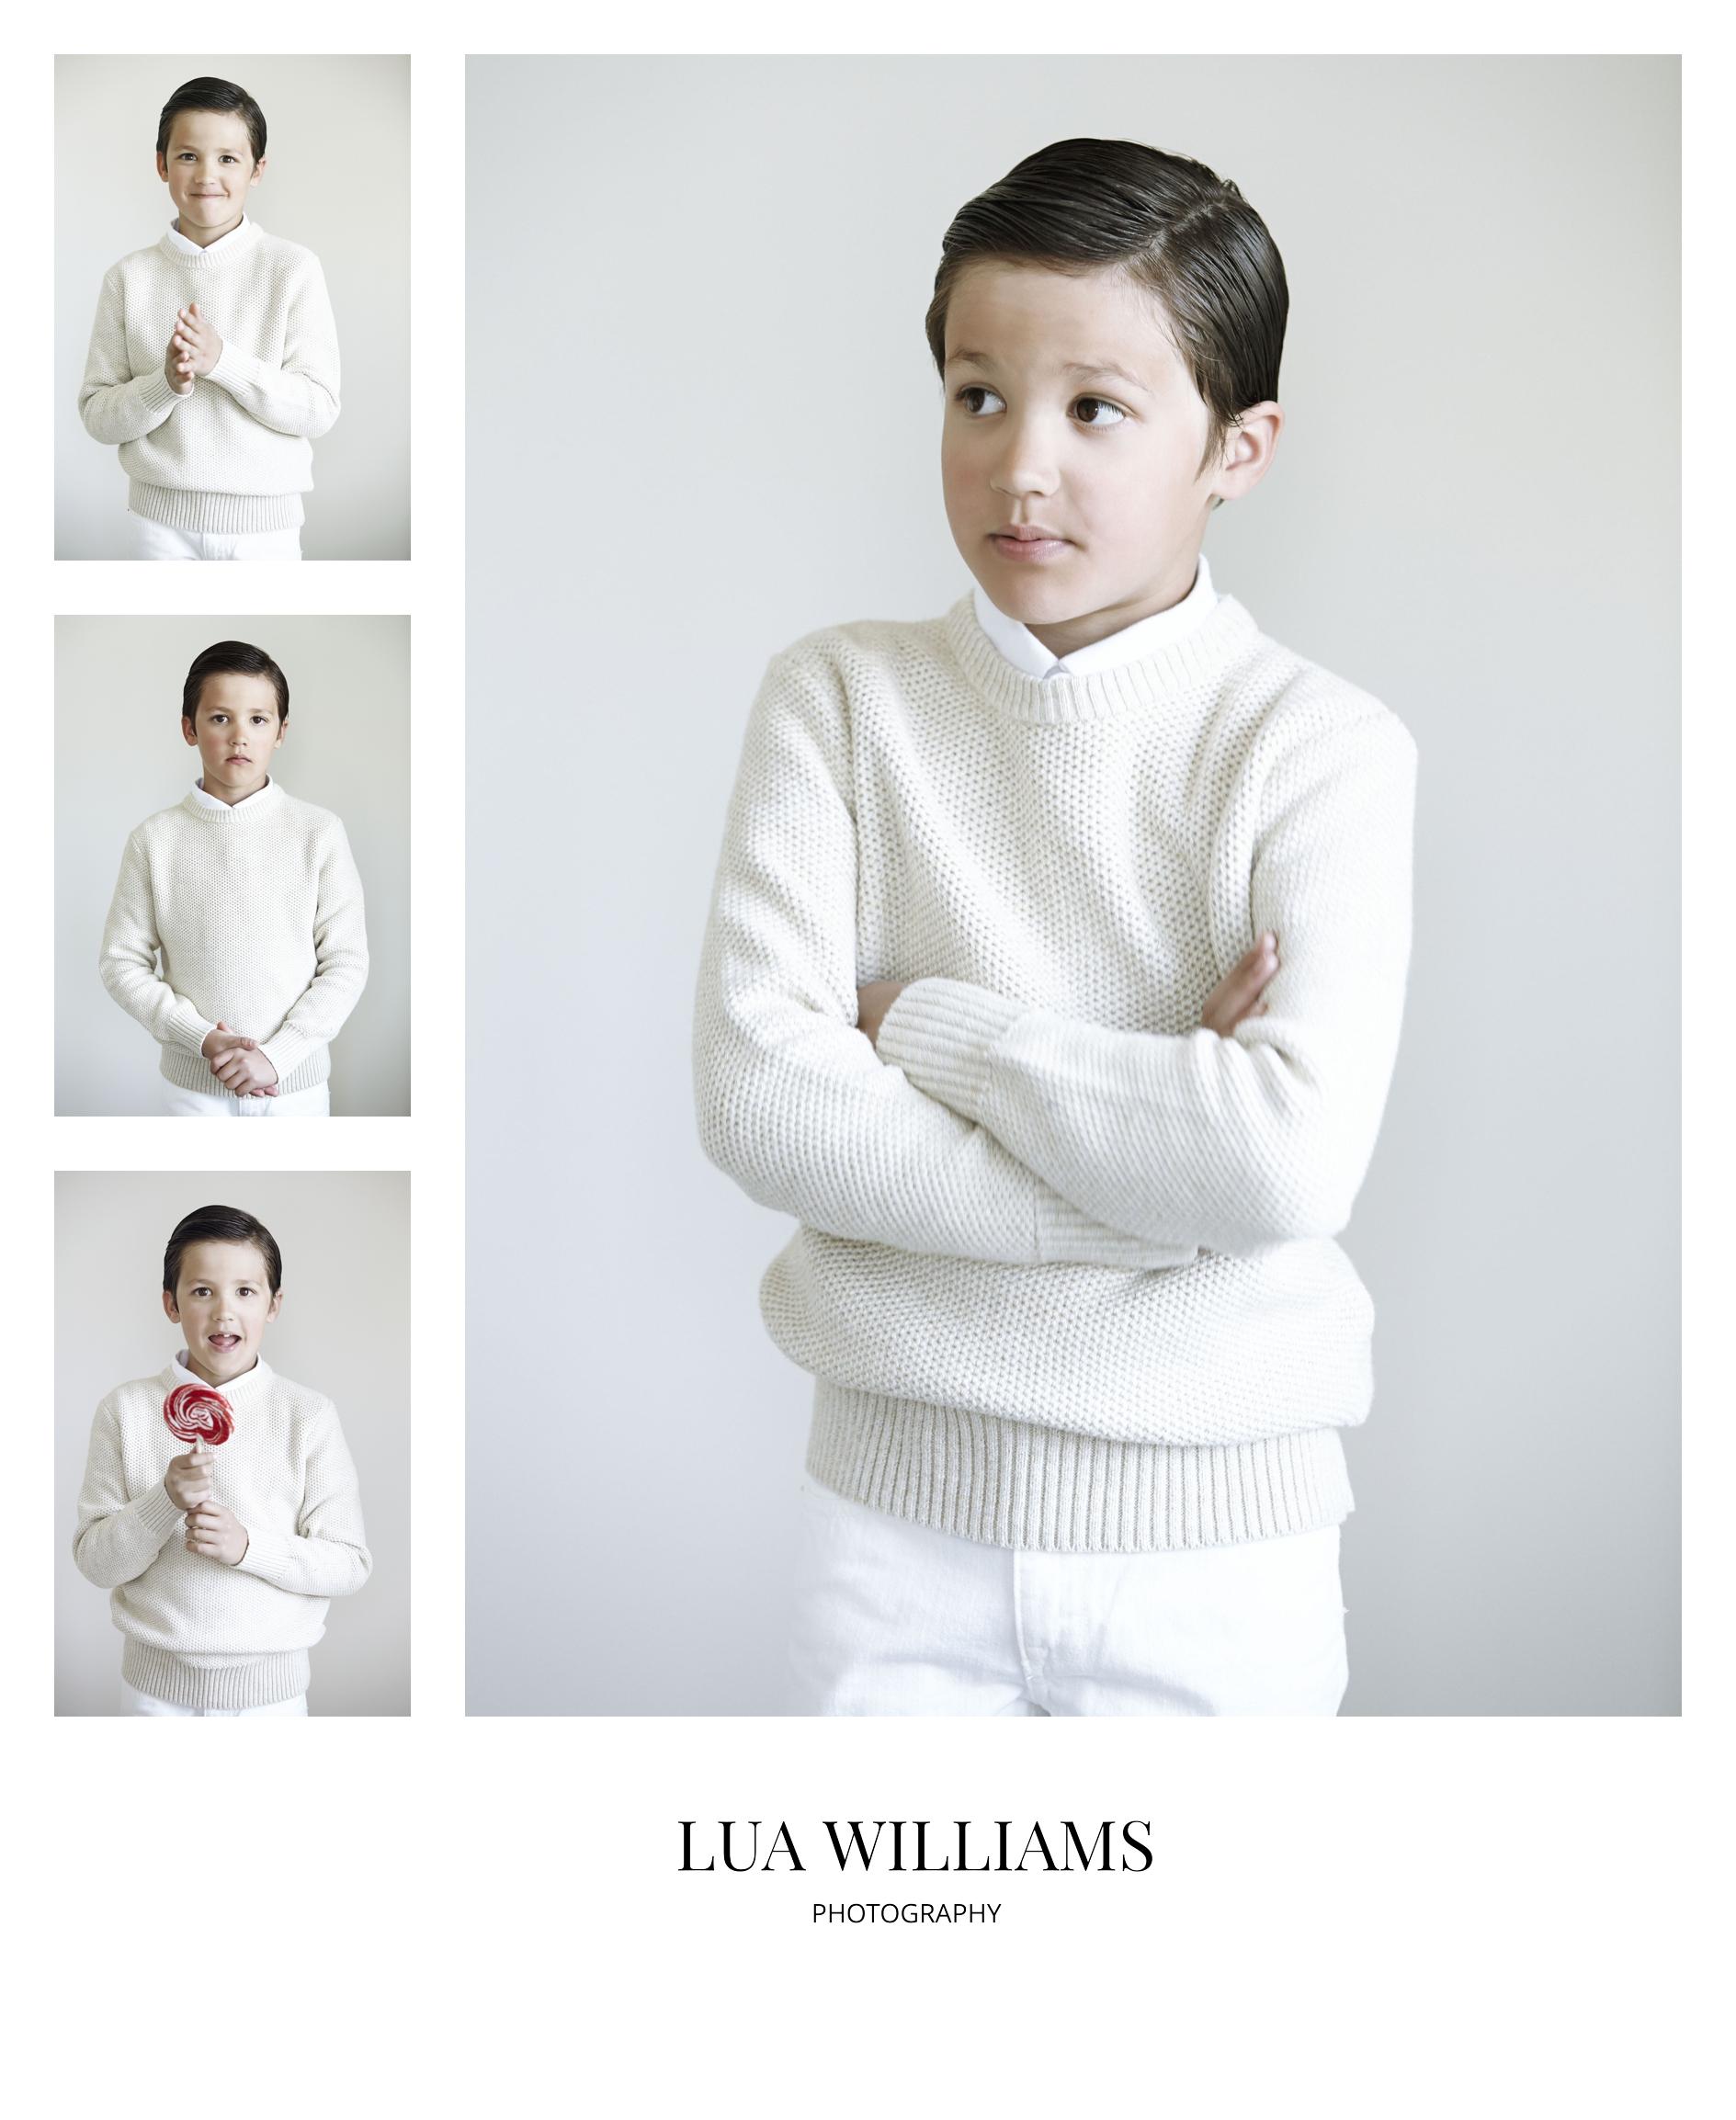 luawilliams.childrenphotography